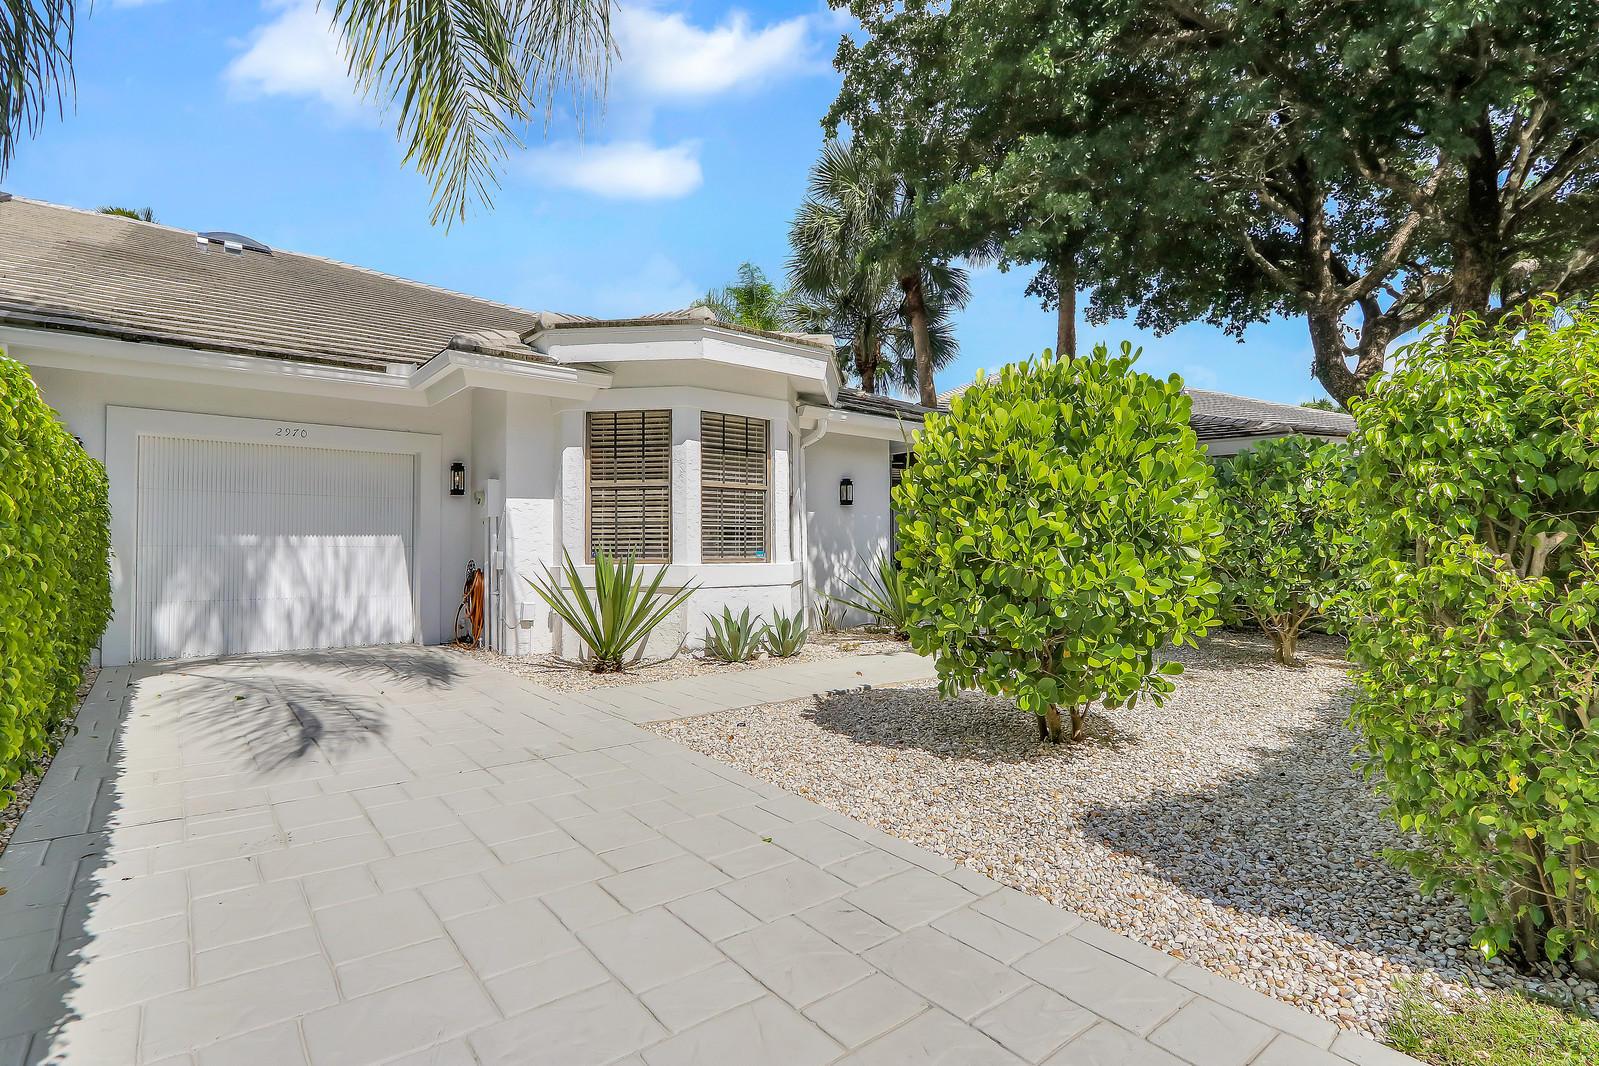 2970 Twin Oaks Way, Wellington, Florida 33414, 3 Bedrooms Bedrooms, ,3 BathroomsBathrooms,Villa,For Sale,Palm Beach Polo,Twin Oaks,1,RX-10567162